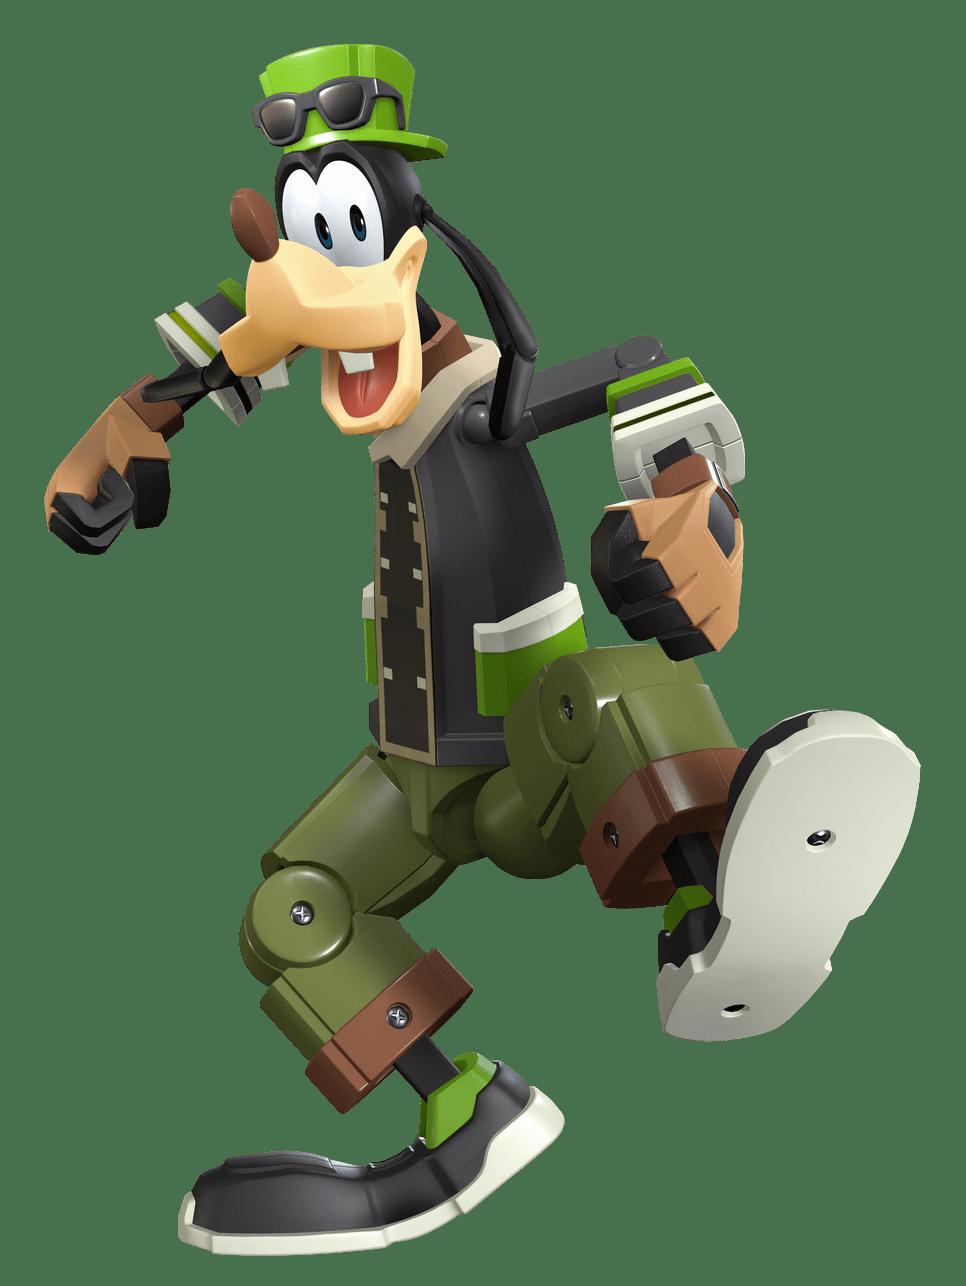 Disney Cartoon Characters Wallpapers In 3d Renders Kingdom Hearts Iii Kingdom Hearts Insider